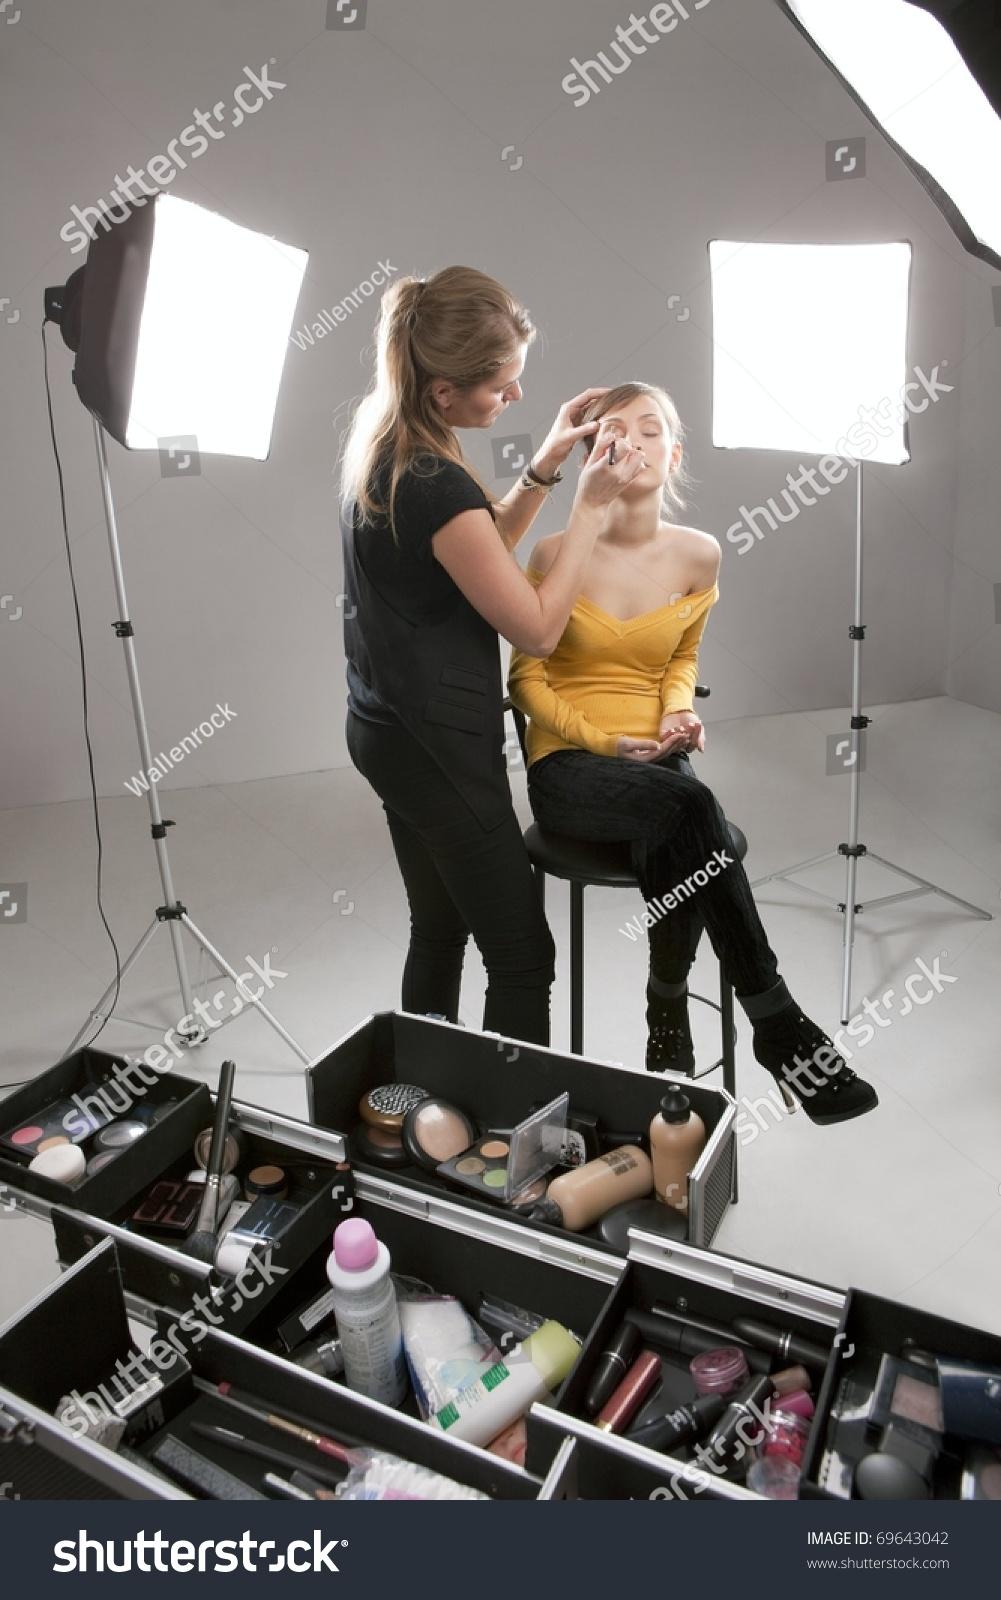 Backstage Scene: Professional Make-Up Artist Doing Glamour Model Makeup At Work Stock Photo 69643042 : Shutterstock